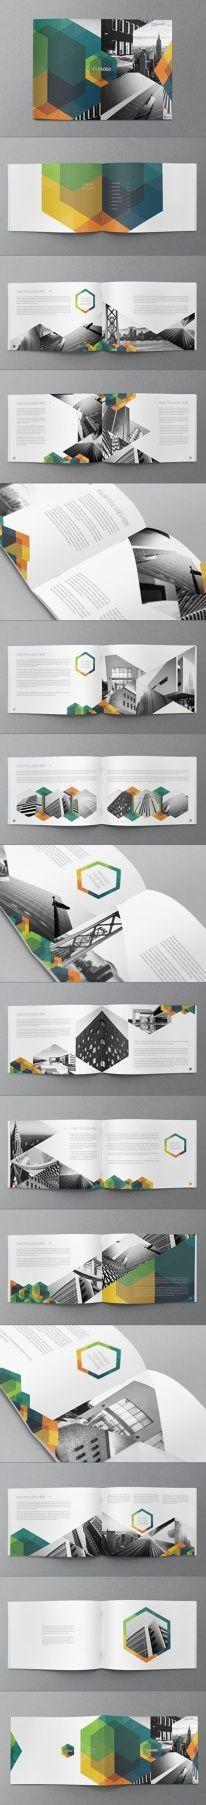 Hexo Brochure Design by Abra Design | Graphic Design